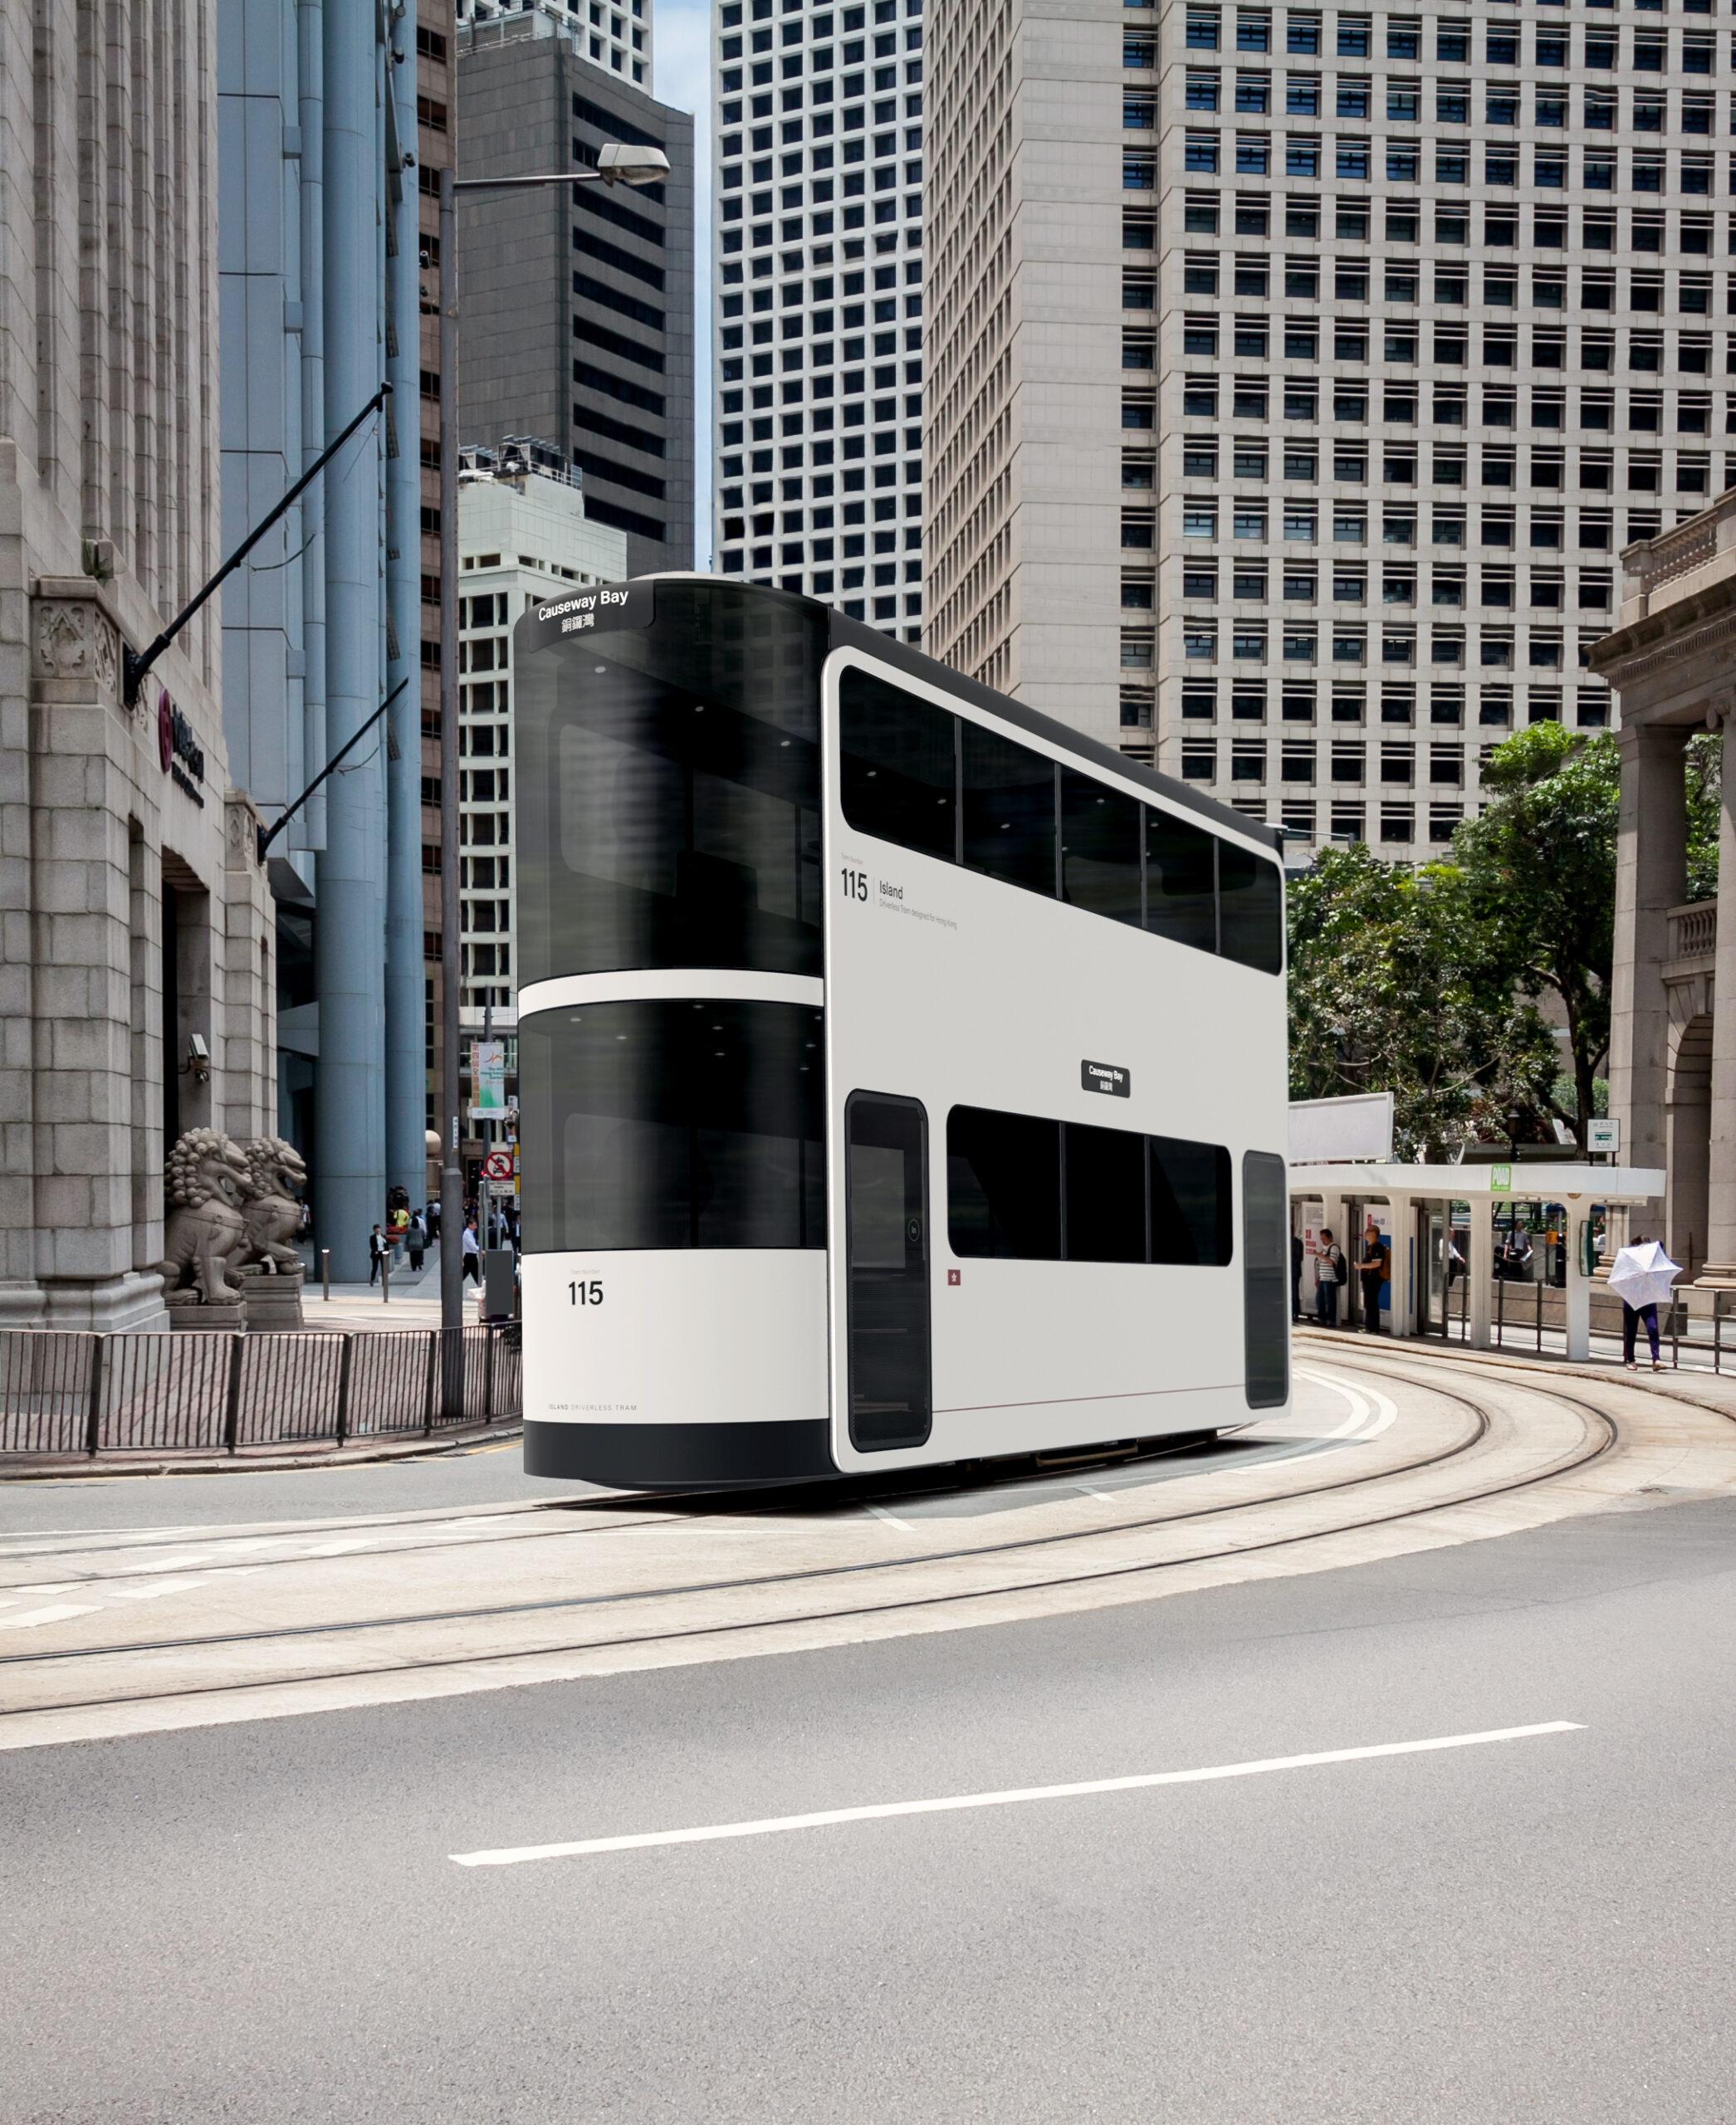 Island tram, Hong Kong, by Andrea Ponti